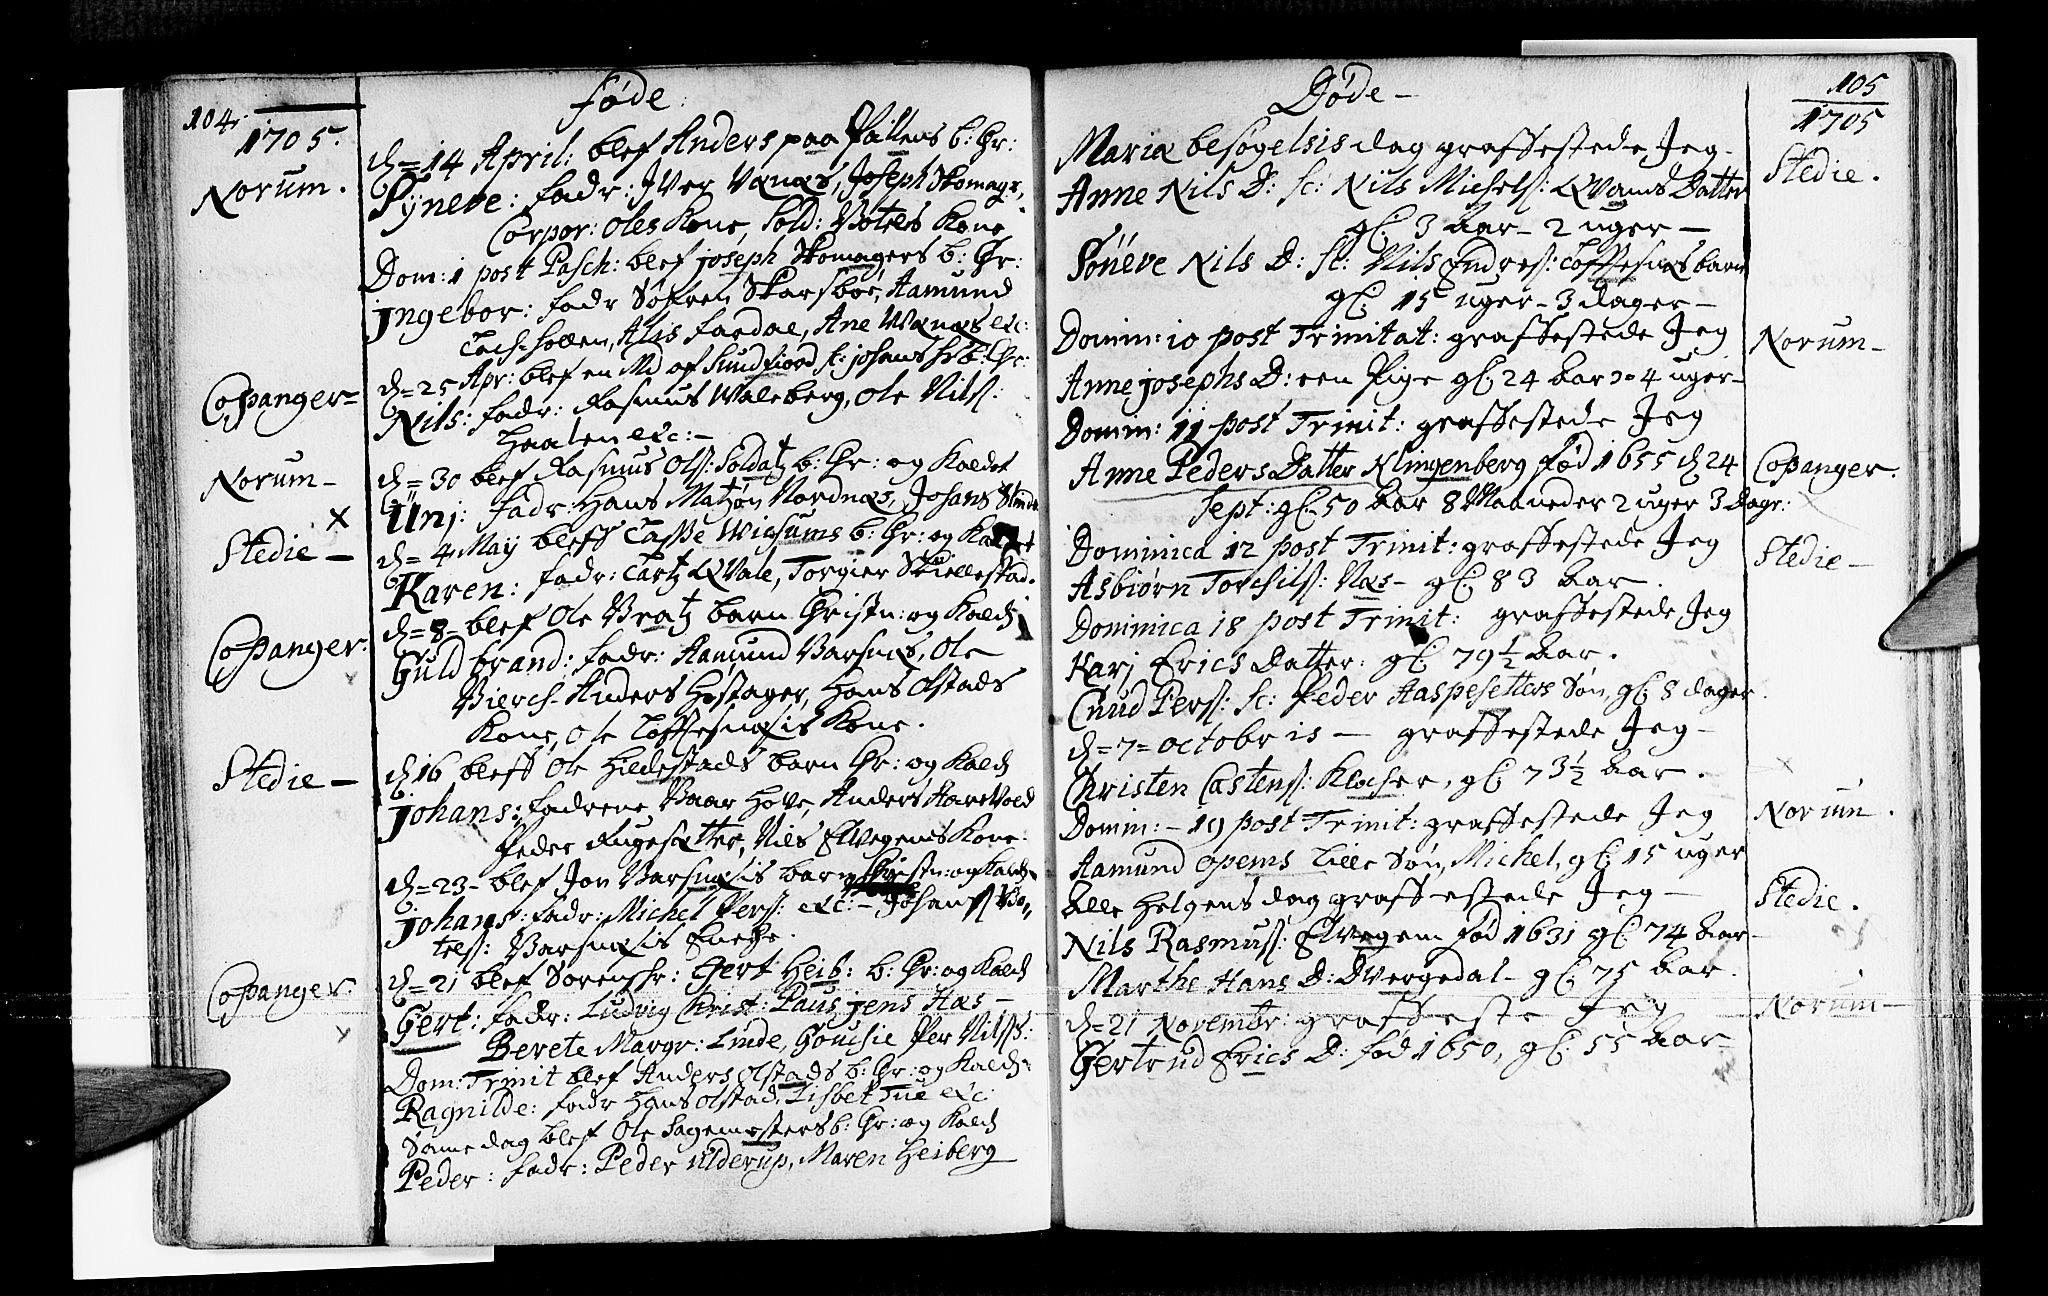 SAB, Sogndal sokneprestembete, H/Haa/Haaa/L0001: Ministerialbok nr. A 1, 1689-1713, s. 104-105